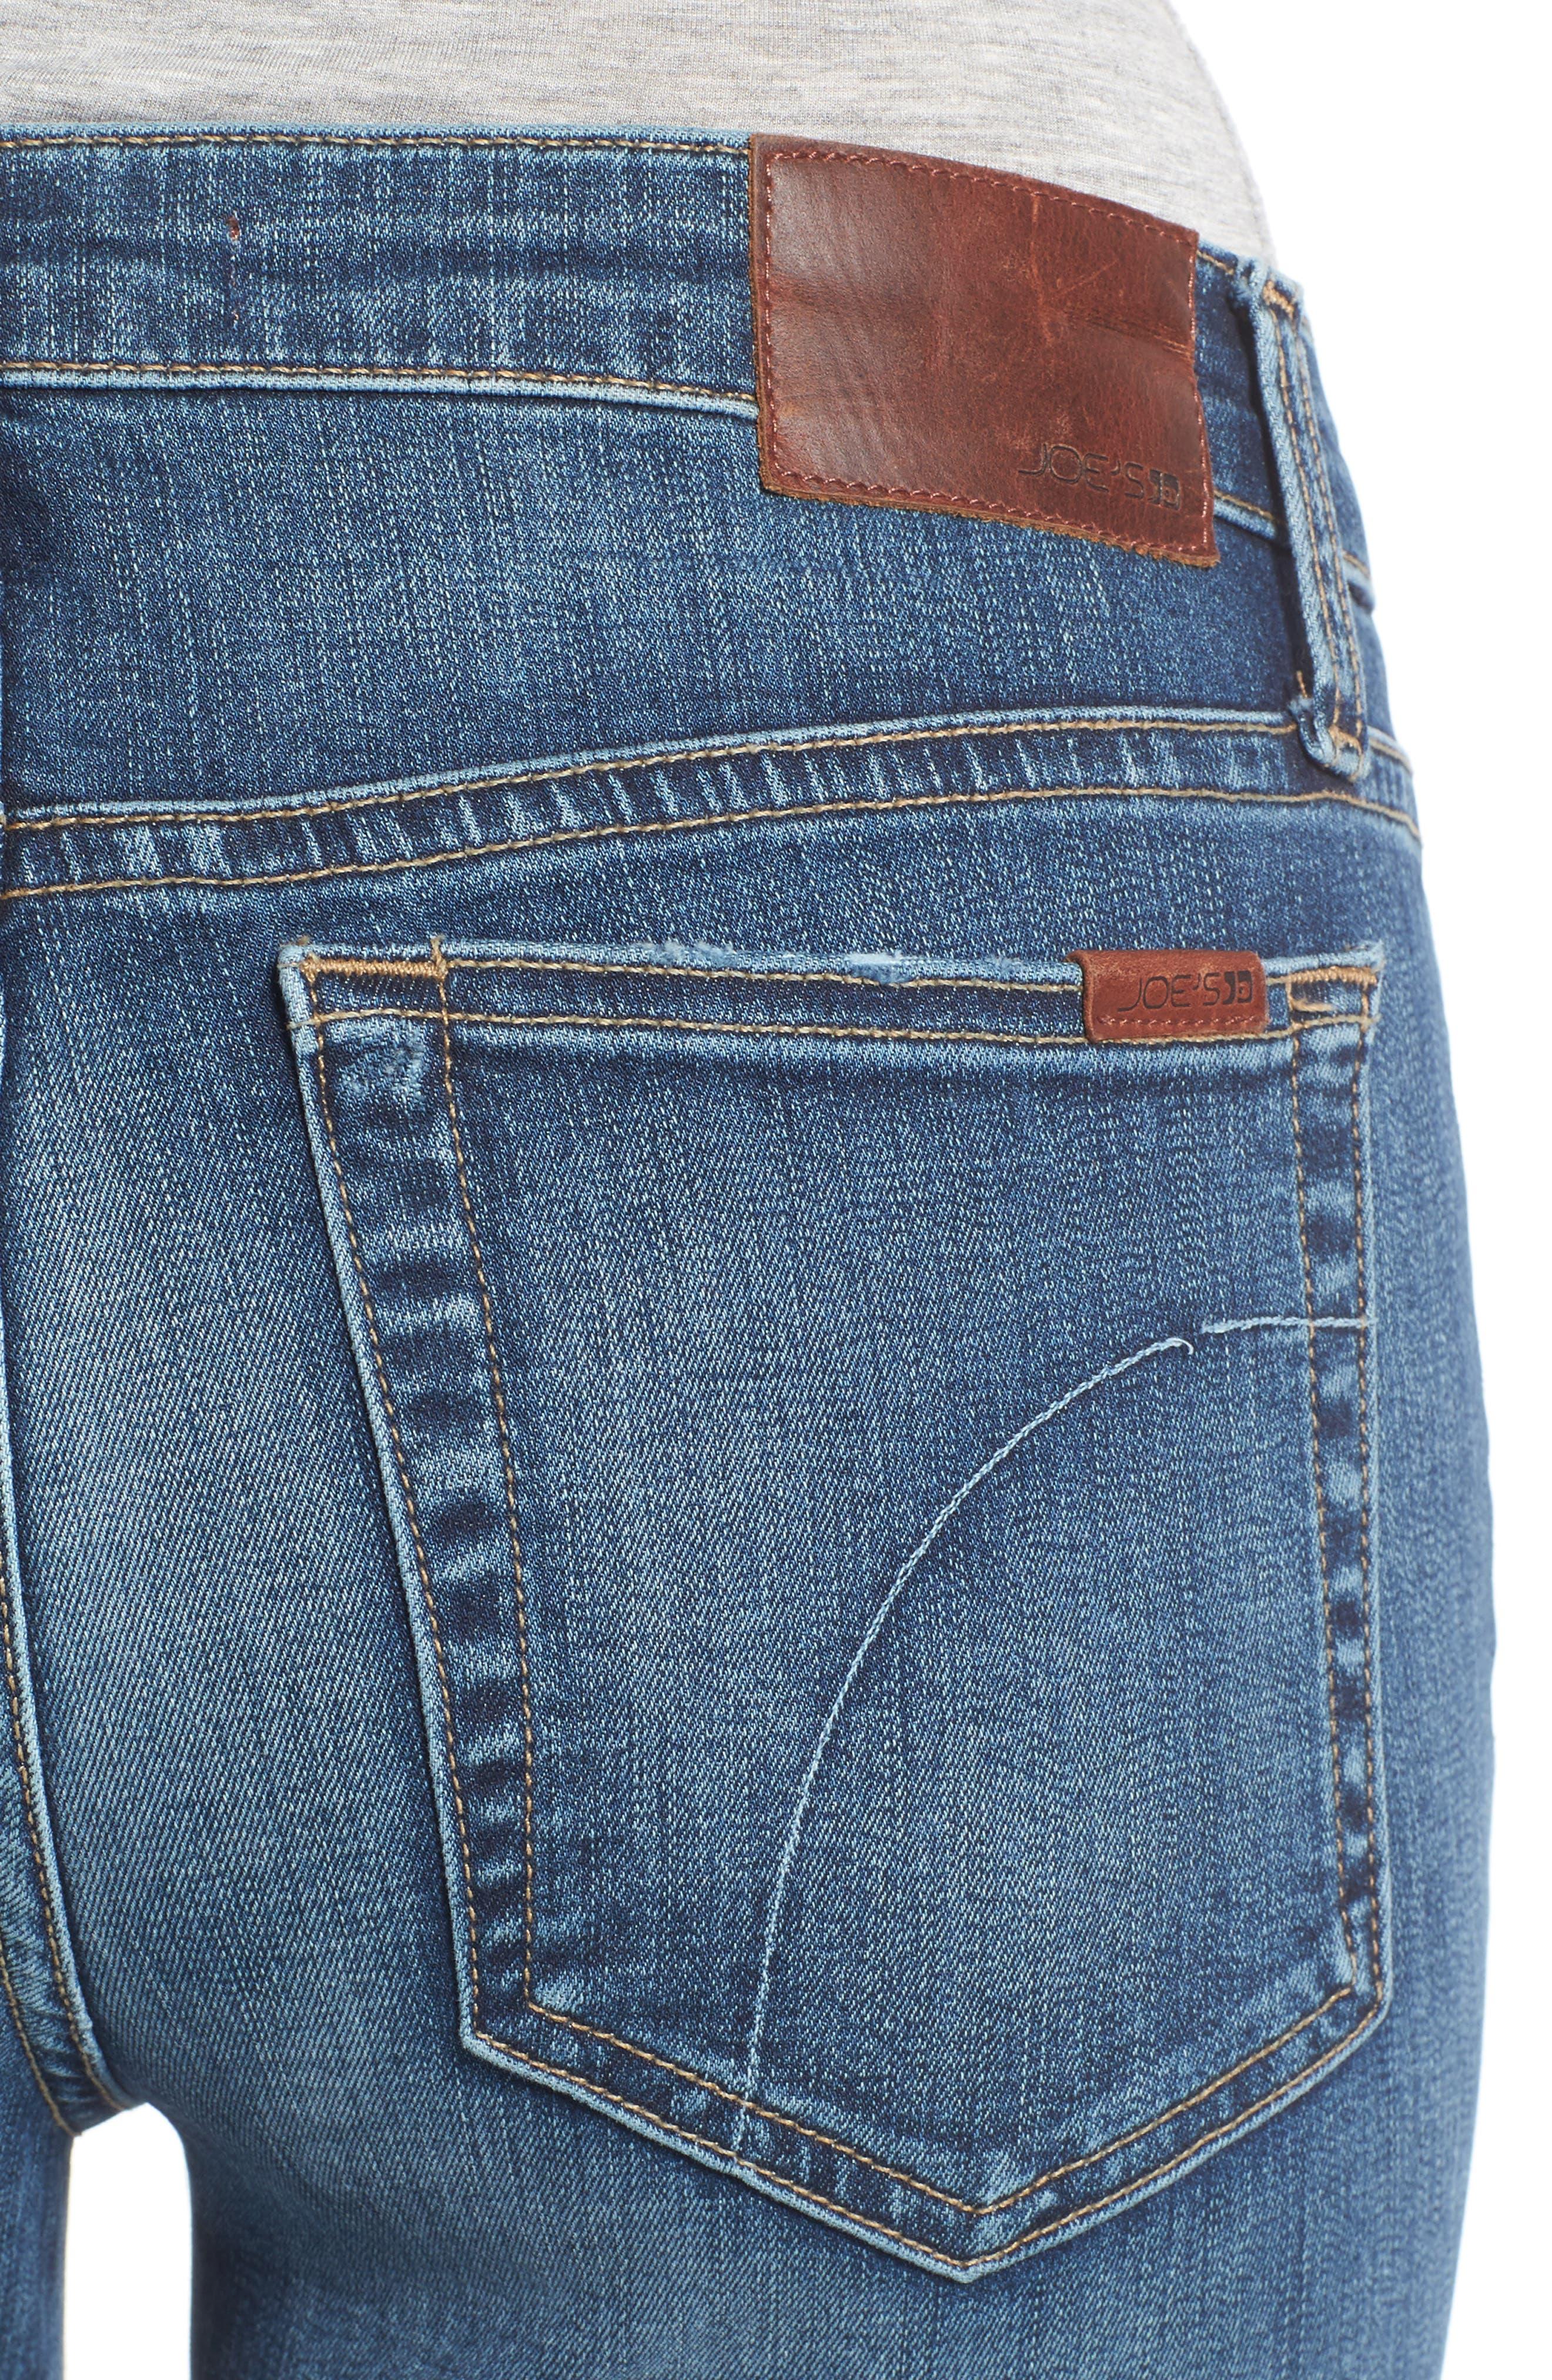 Markie Crop Skinny Jeans,                             Alternate thumbnail 4, color,                             410